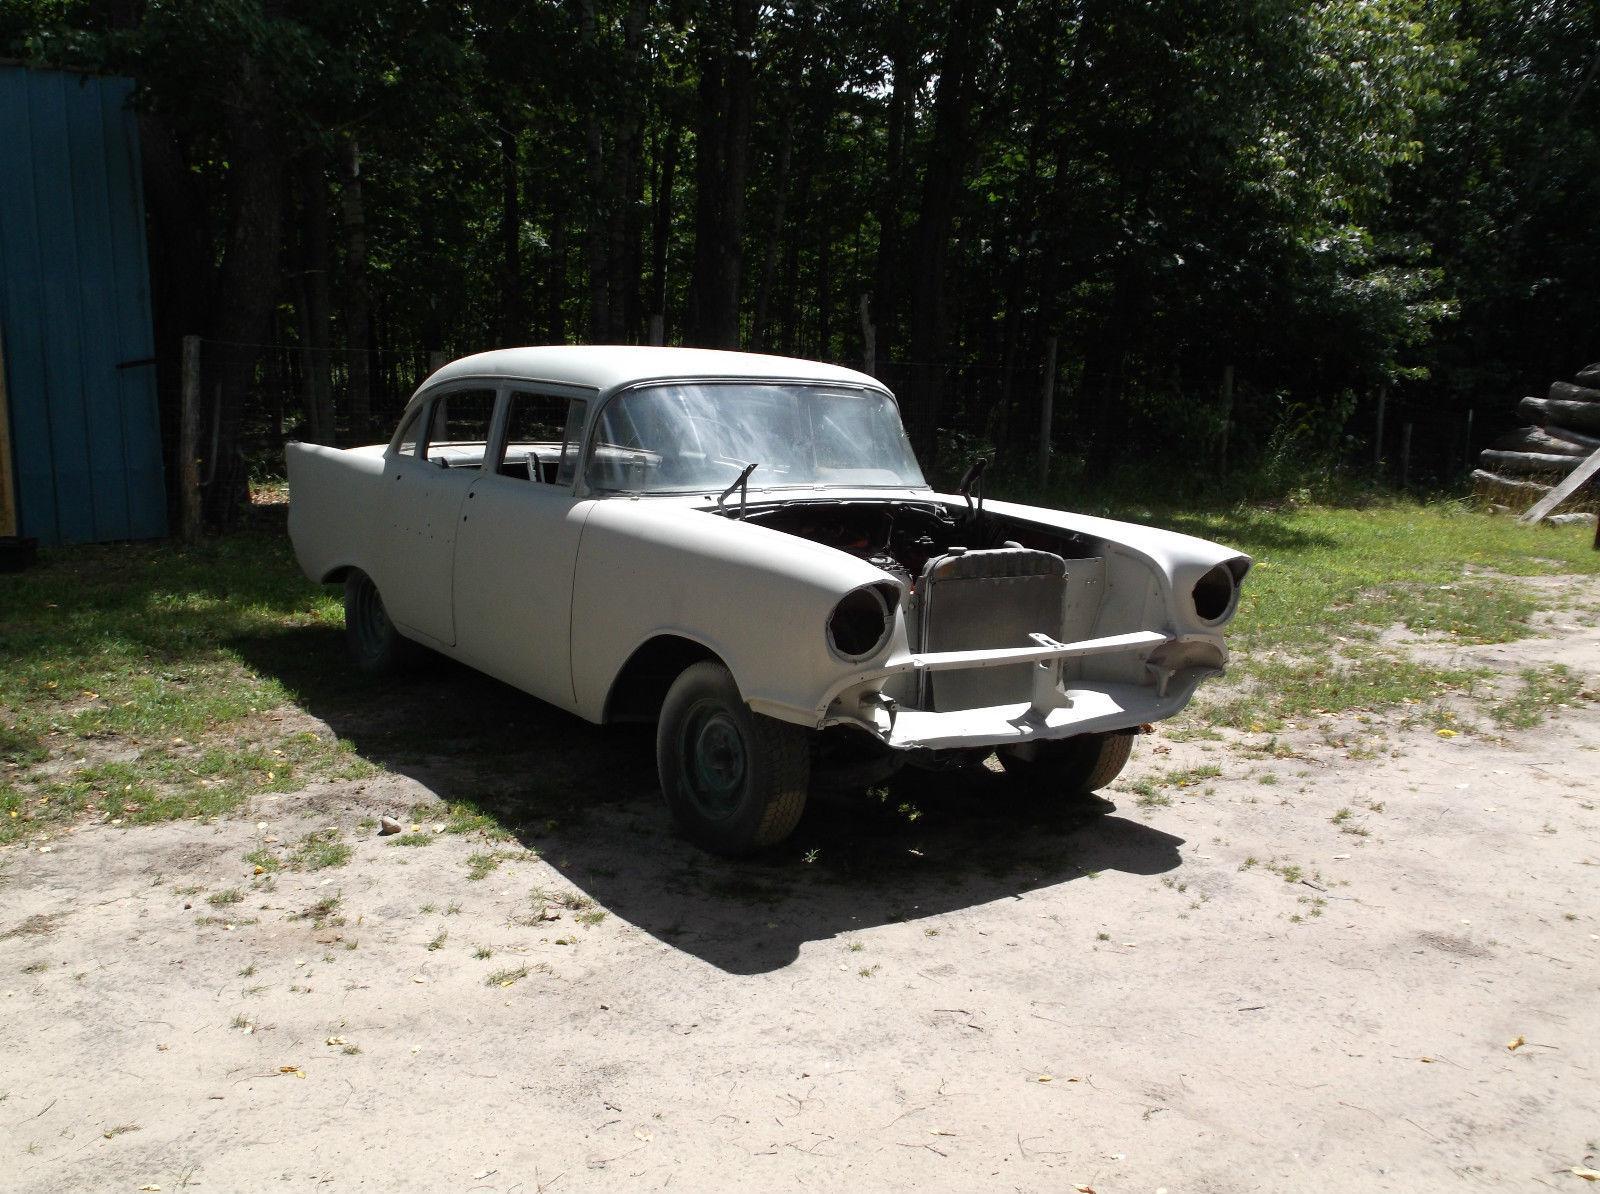 1957 chevrolet bel air 150 210 4 door for sale for Motor cars for sale